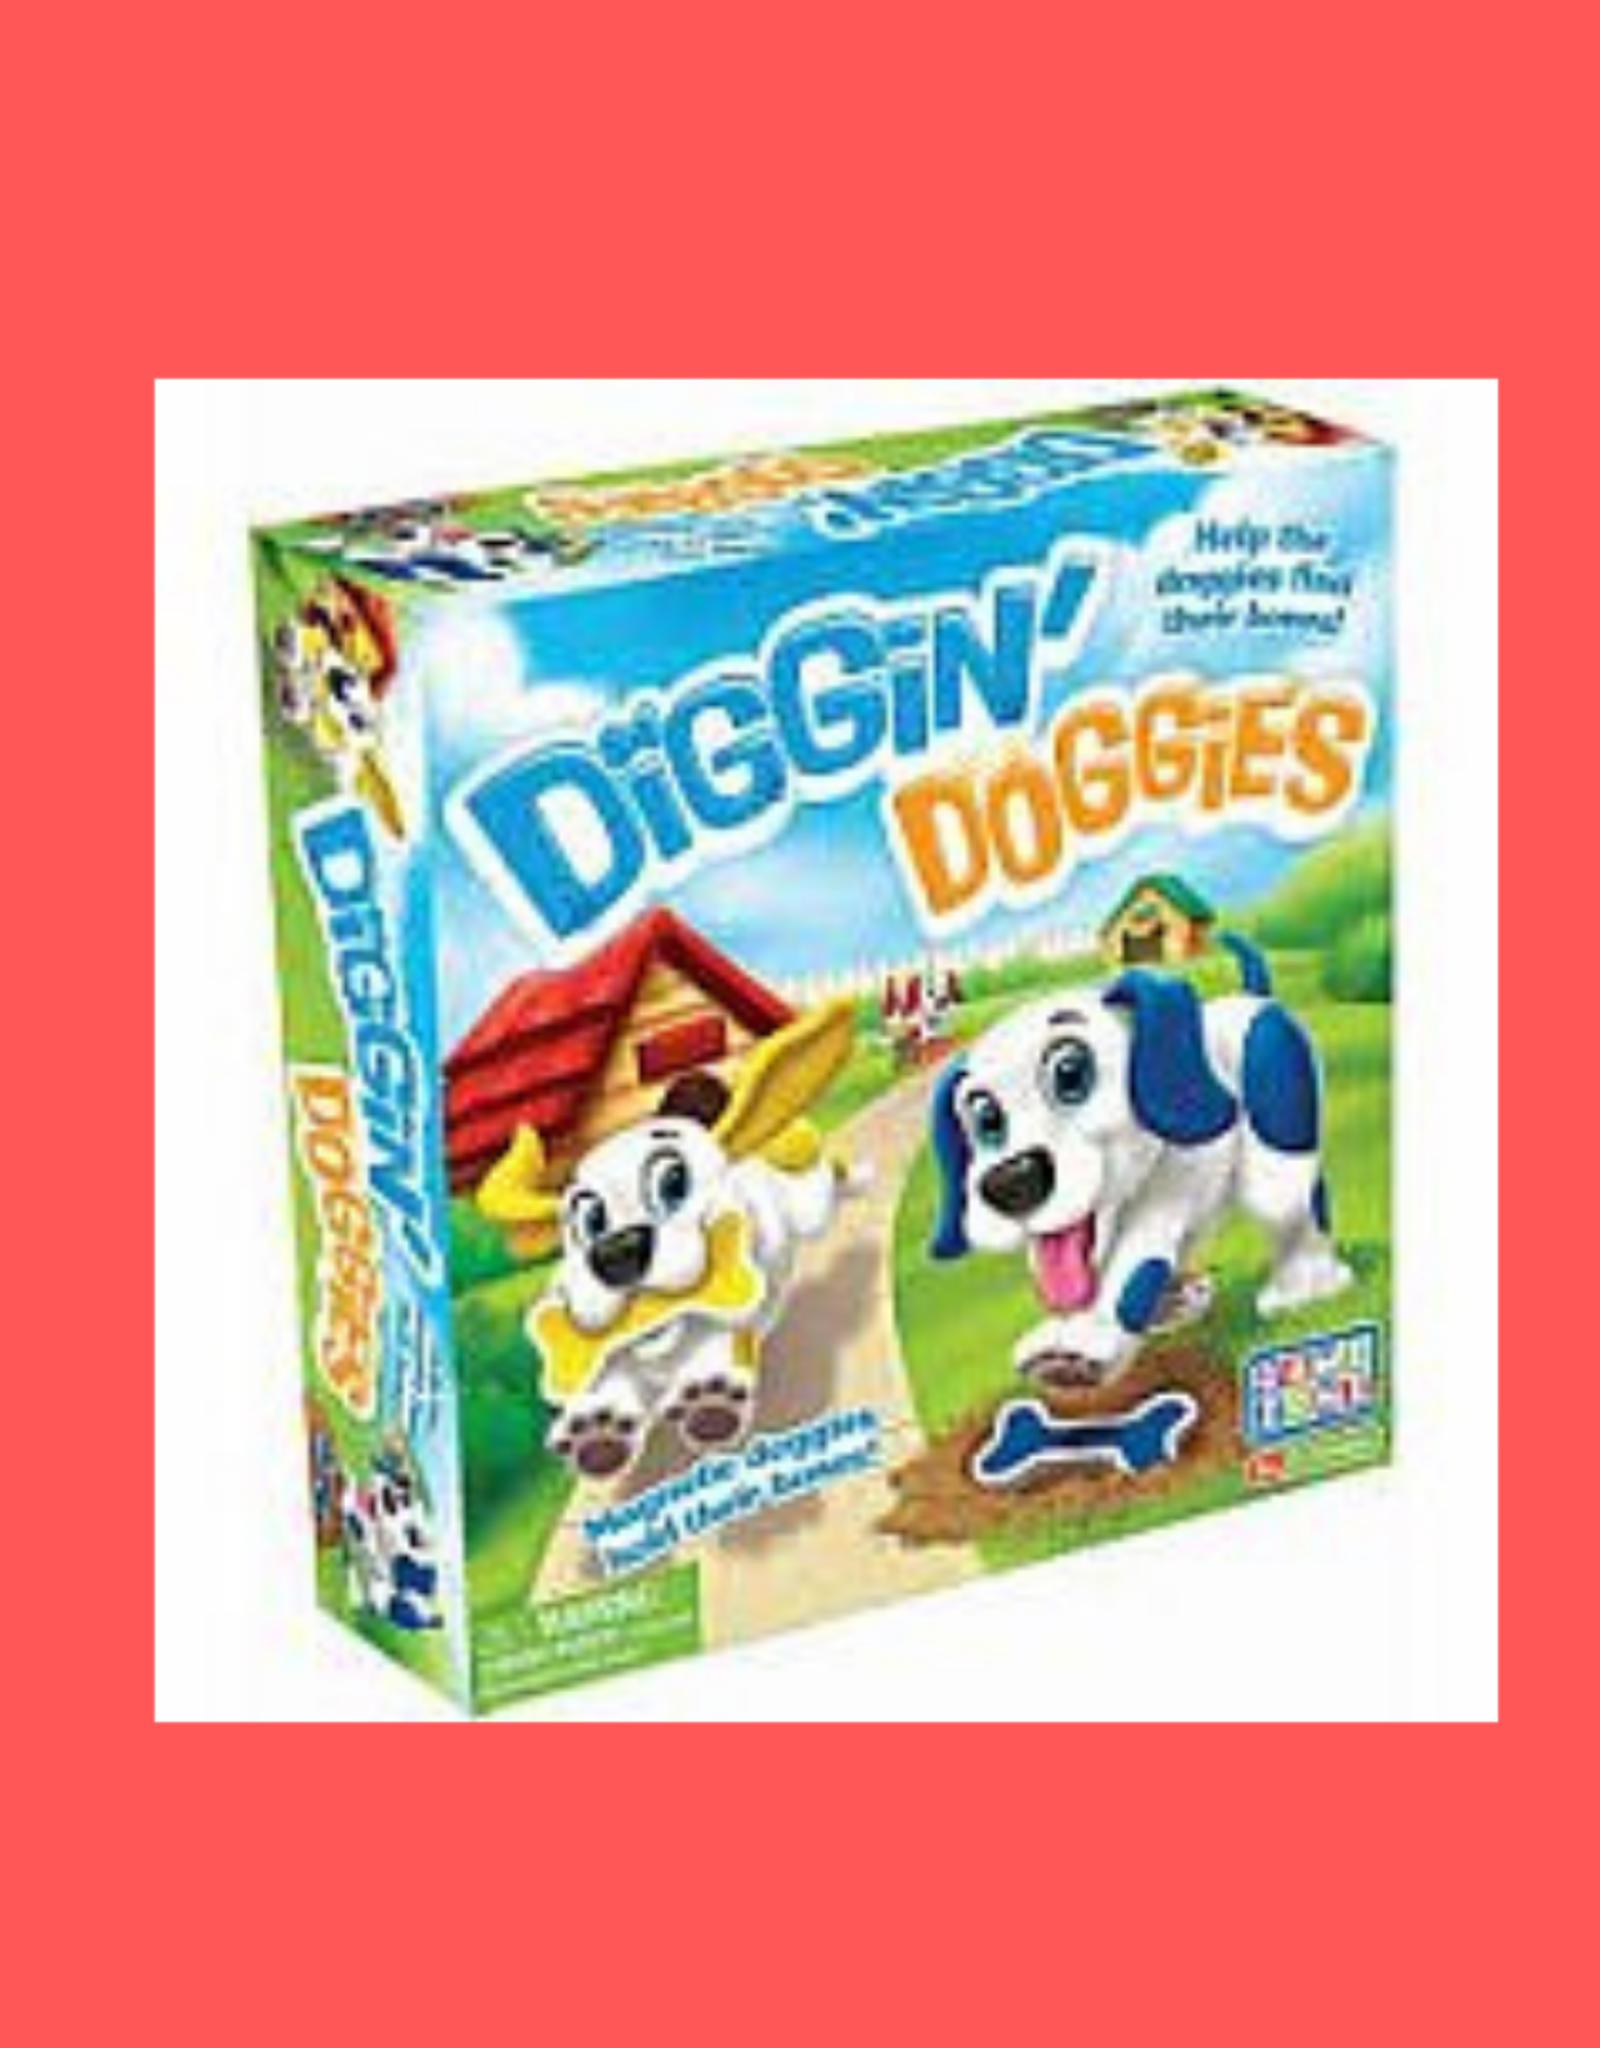 GAME ZONE DIGGIN DOGGIES